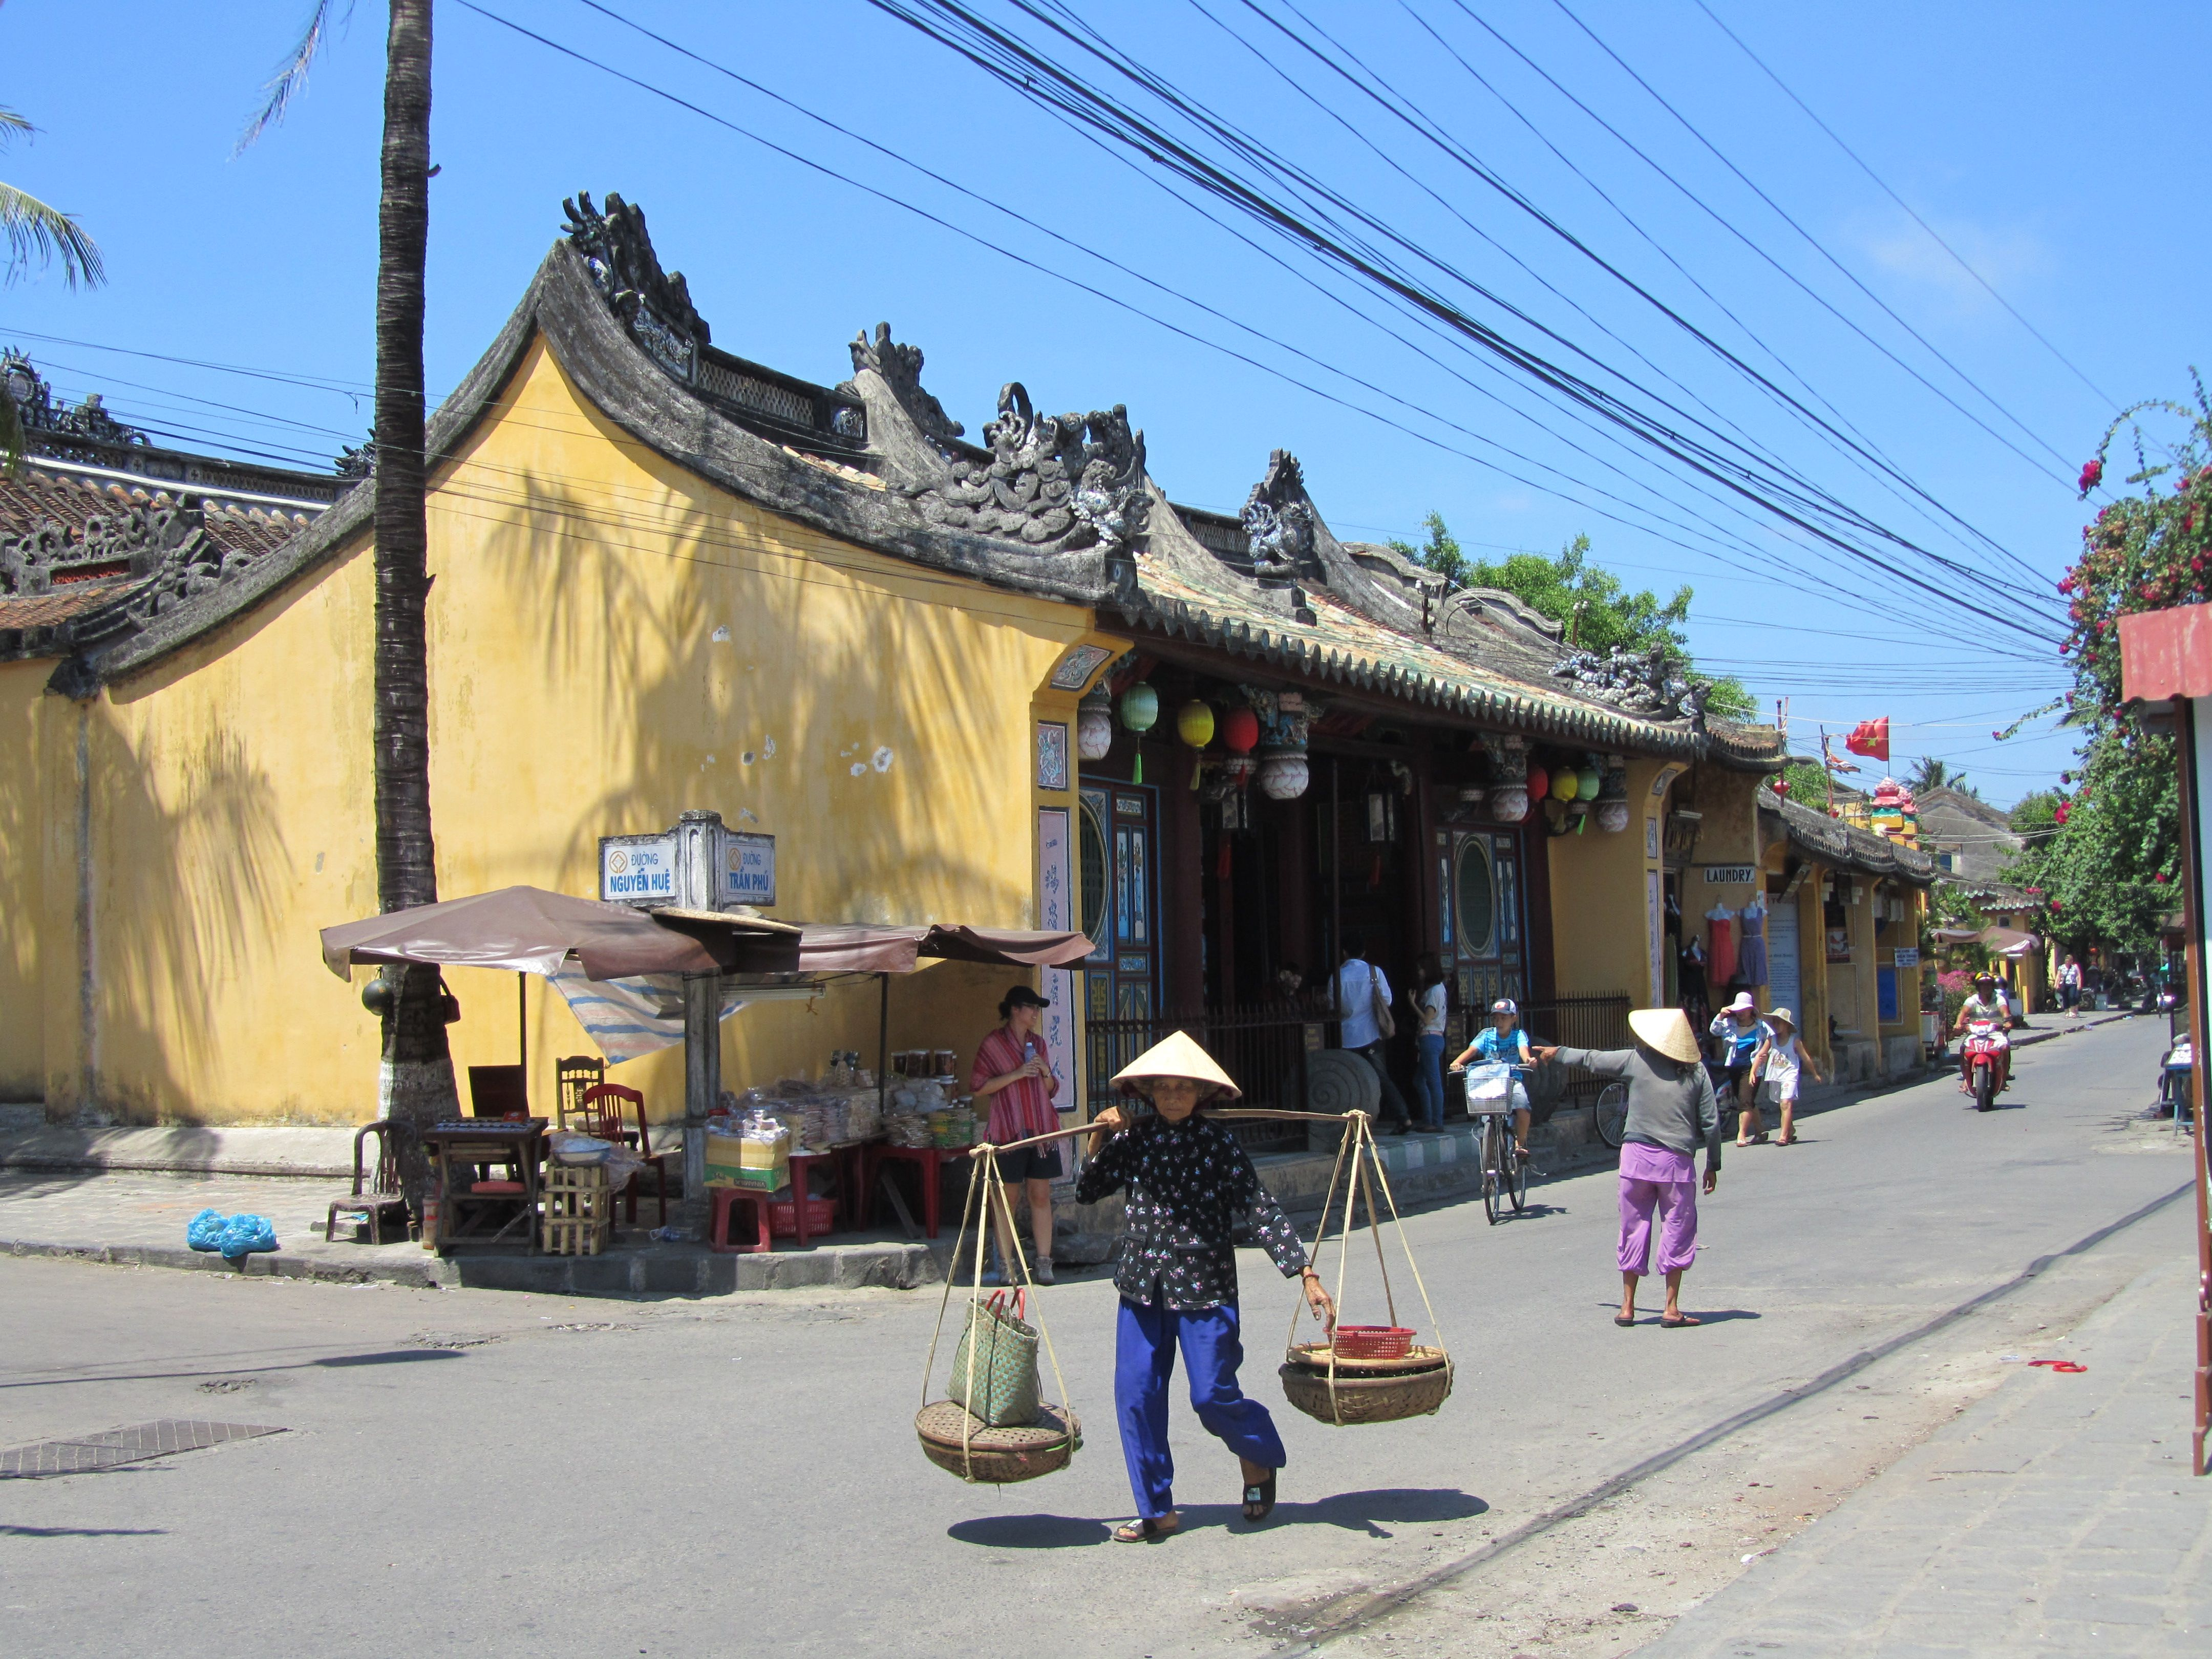 Conical hat, Vietnam